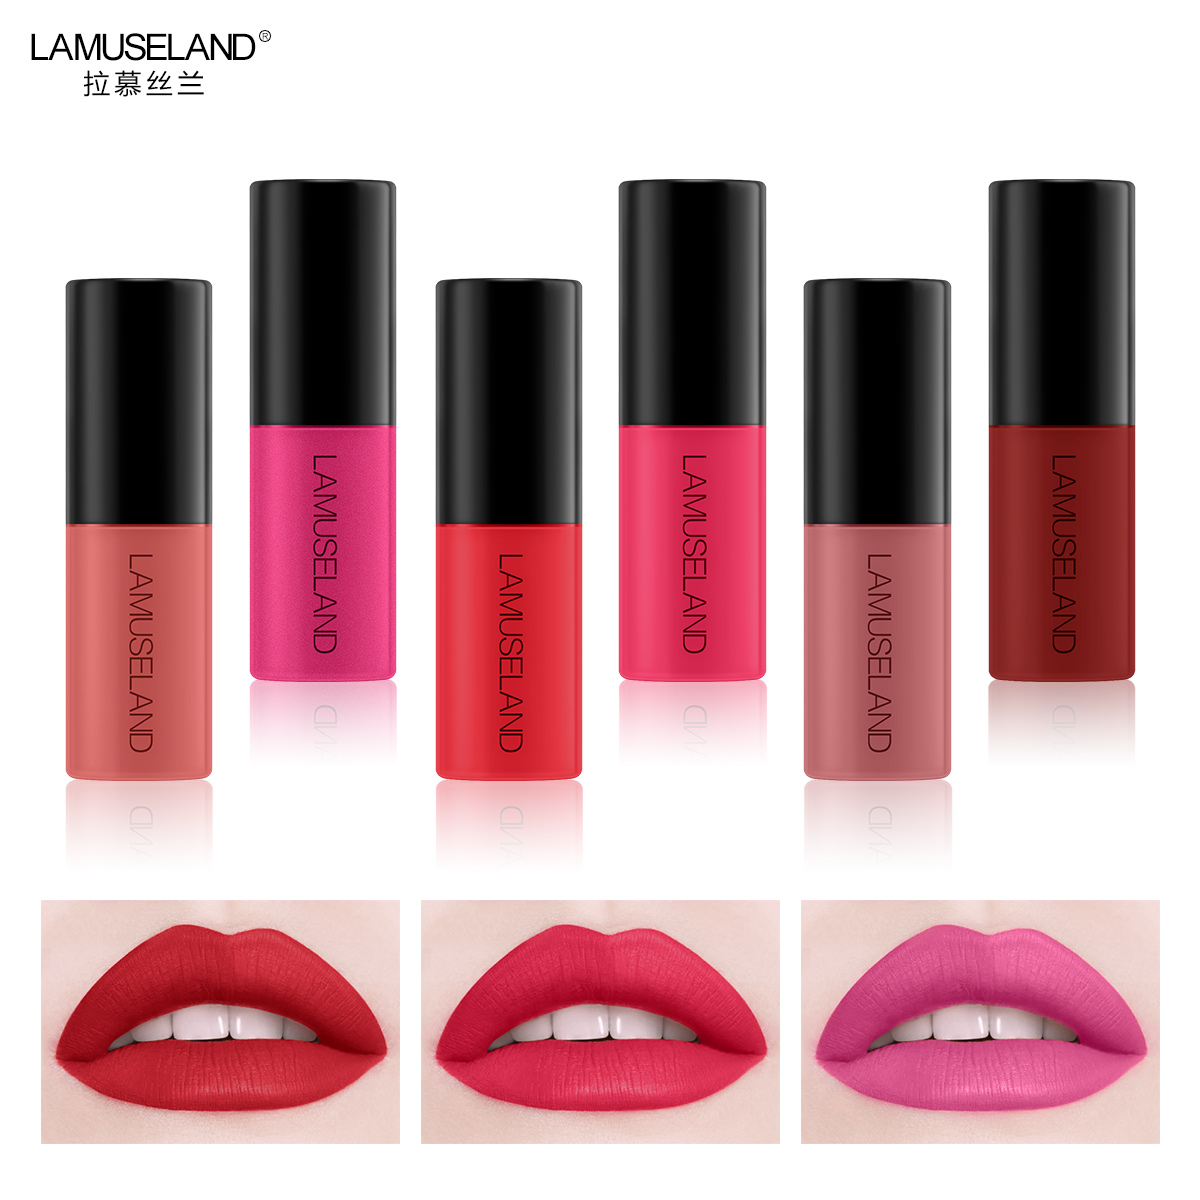 3Pcs Lot Waterproof Long Lasting Matte Mini Lipstick 12 Colors Lip Gloss 3 5g Lips Makeup Brand LAMUSELAND L18L13 in Lipstick from Beauty Health